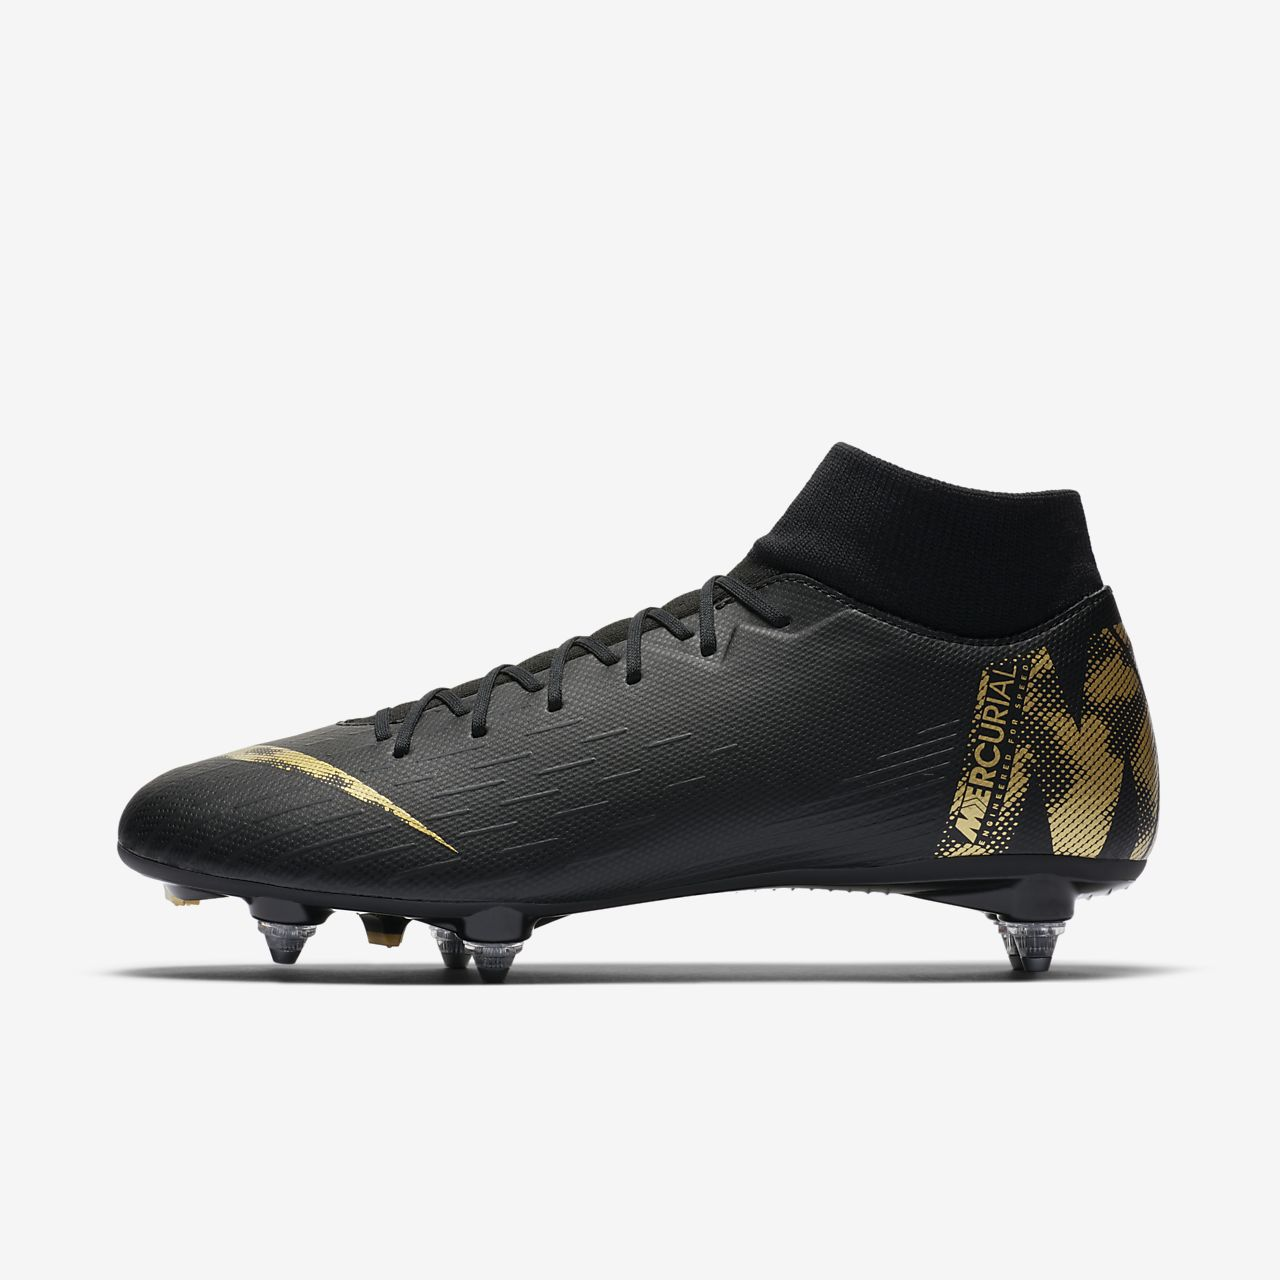 best picked up best deals on Chaussure de football à crampons pour terrain gras Nike Mercurial Superfly  VI Academy SG-PRO